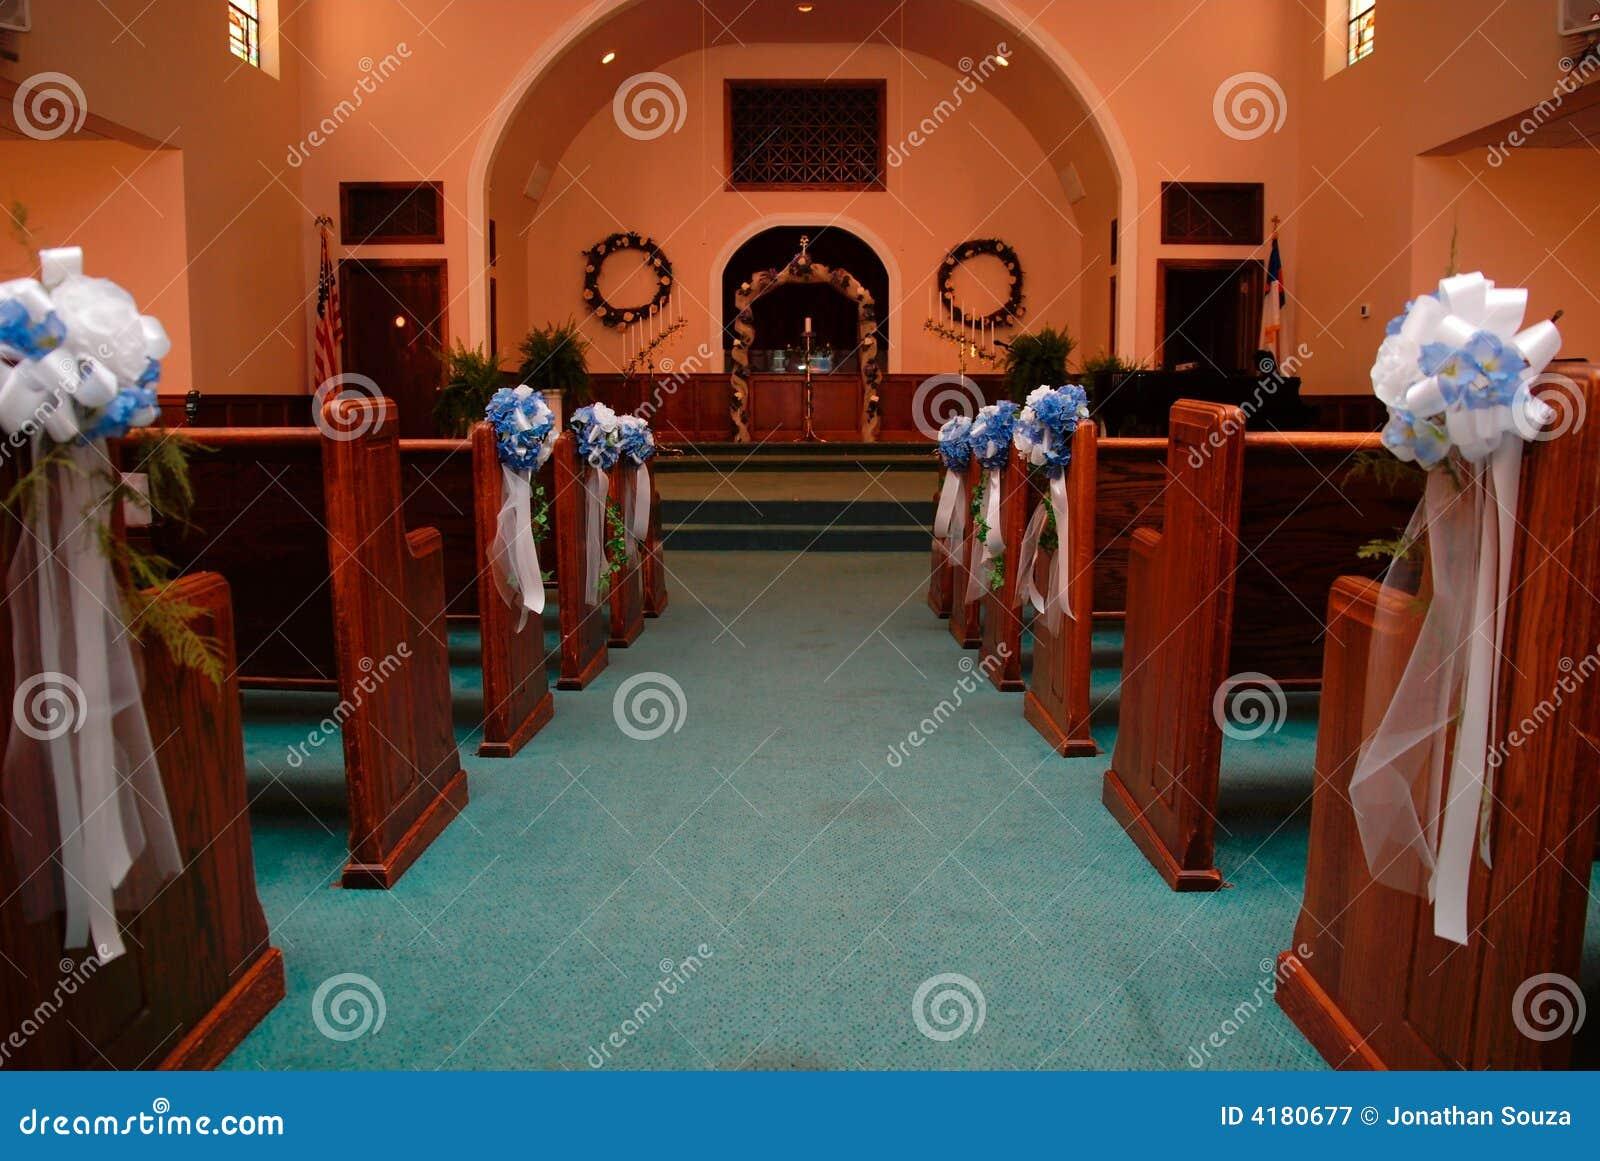 Church aisle for wedding